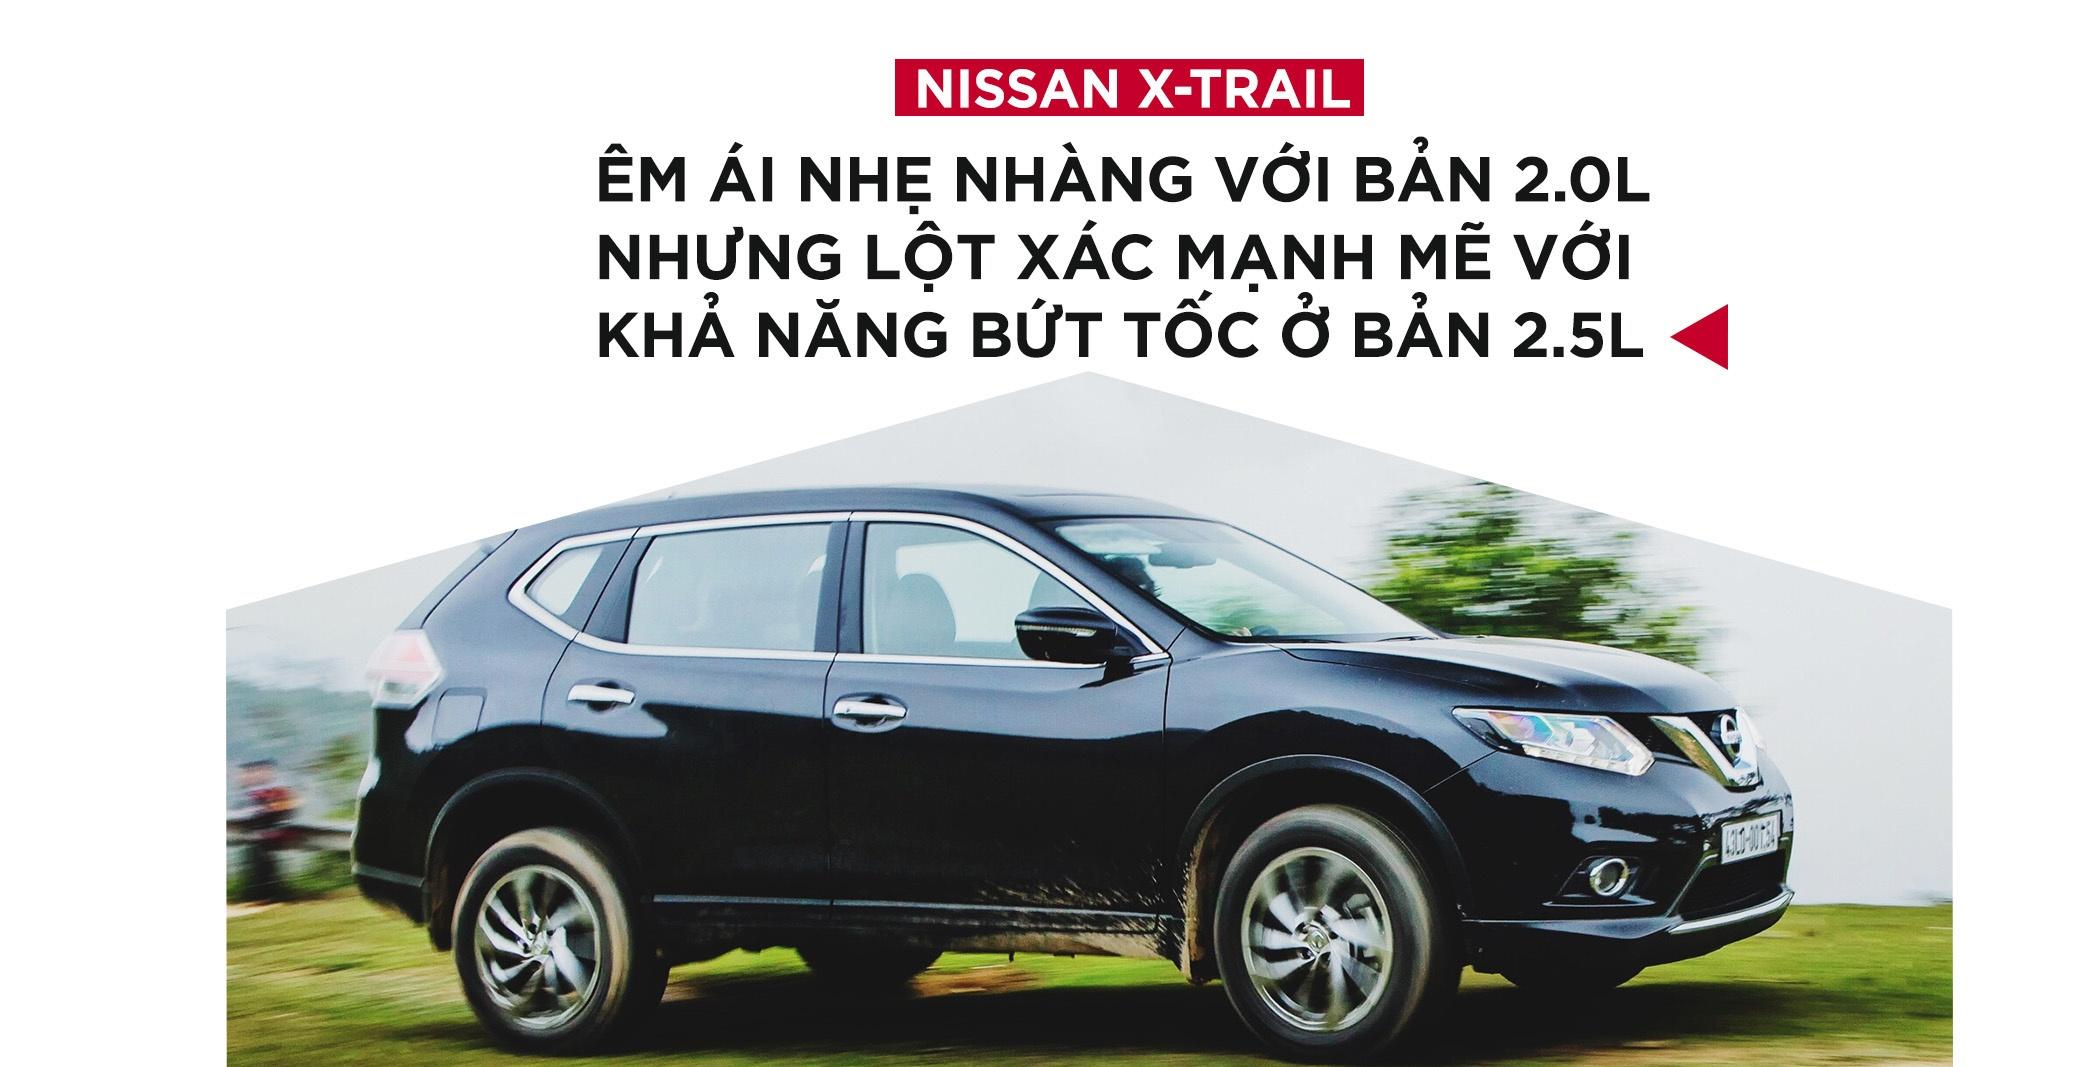 Danh gia Nissan X-Trail: Chay dua ve gia va cong nghe an toan hinh anh 3